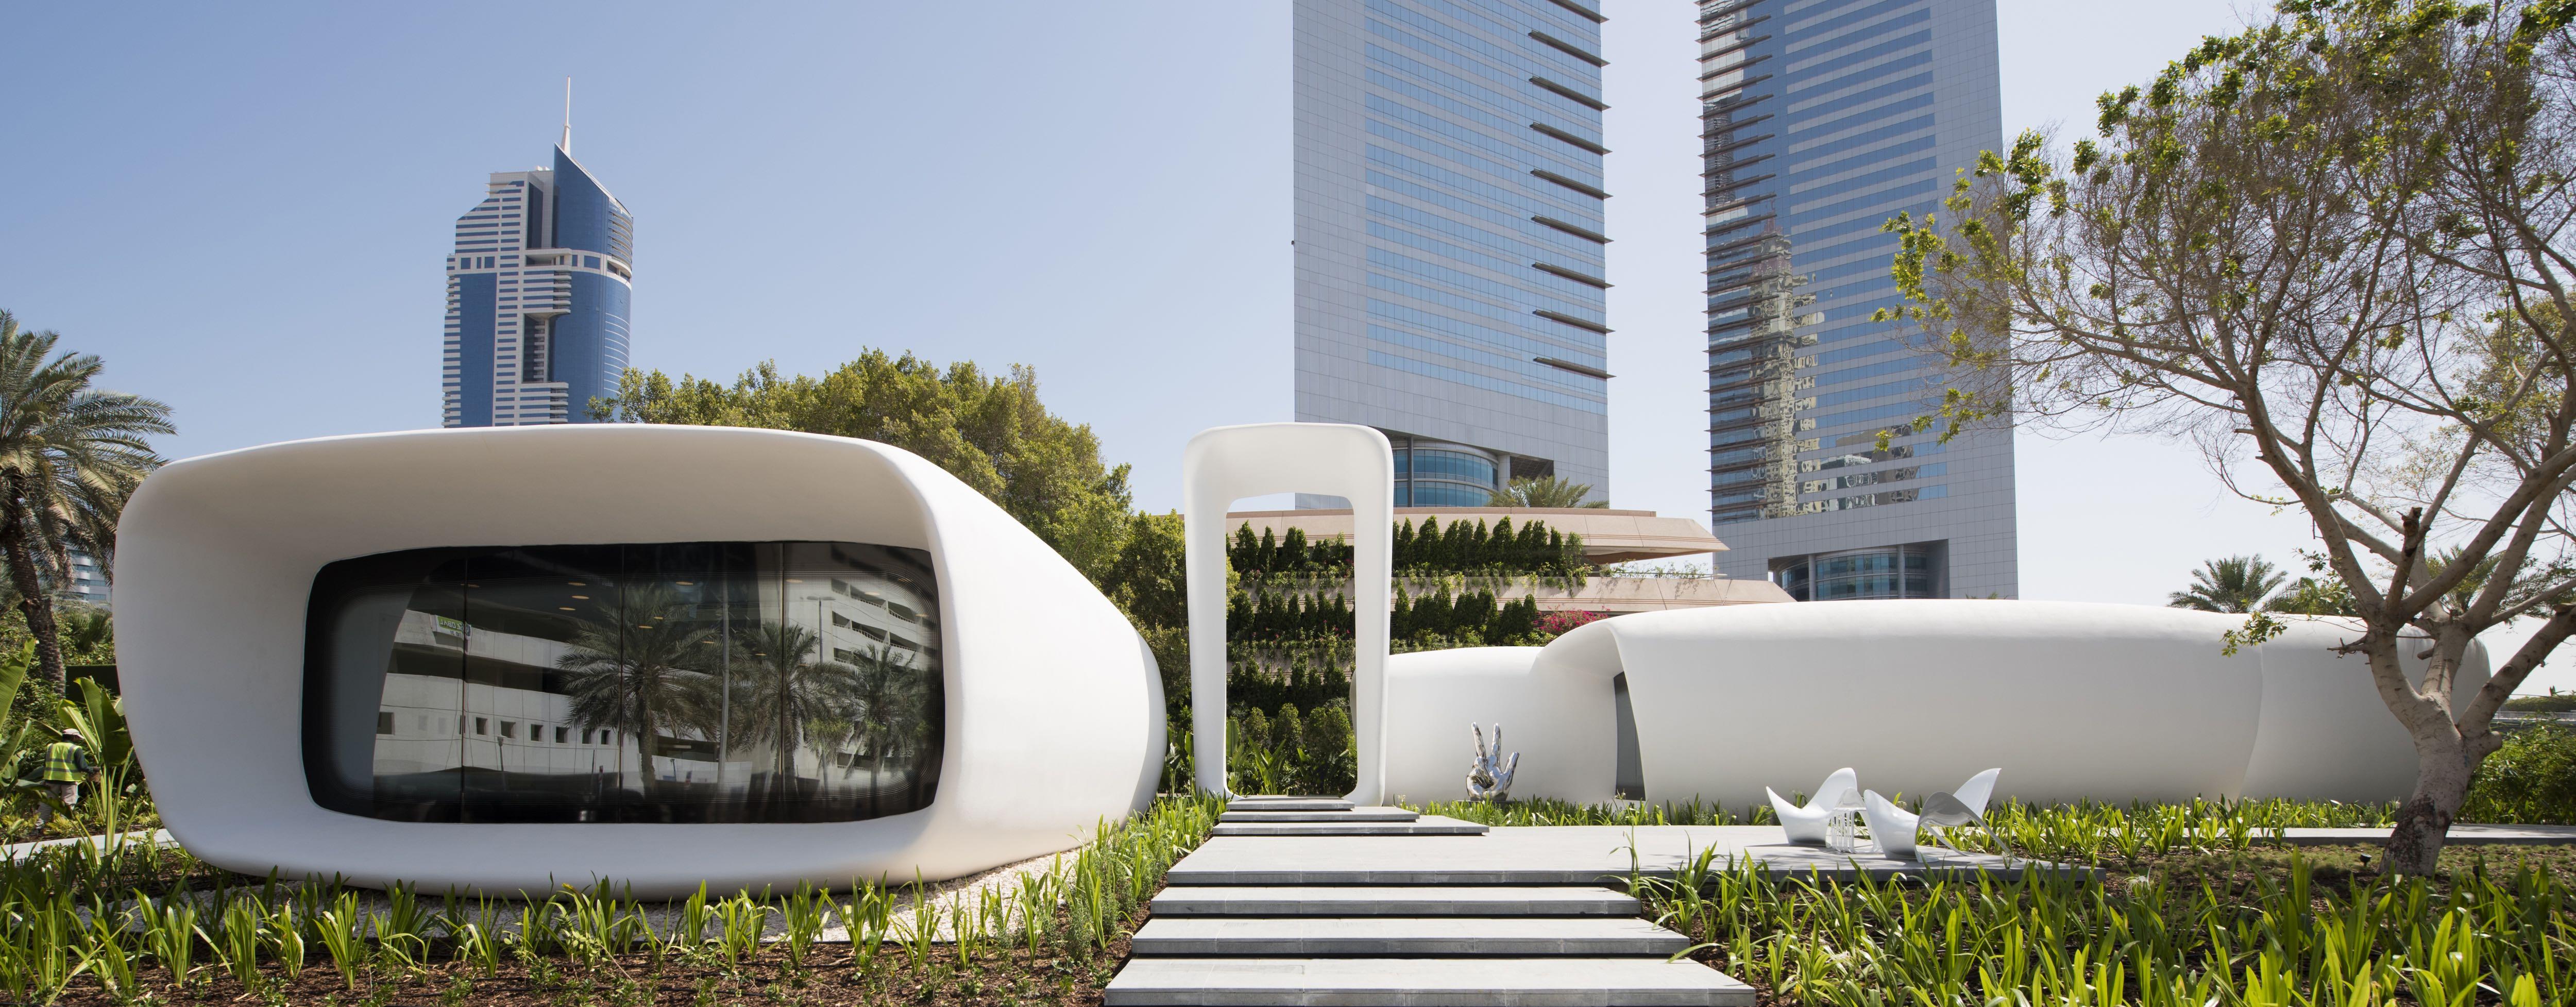 Dubai S Most Breathtaking Designs Revealed